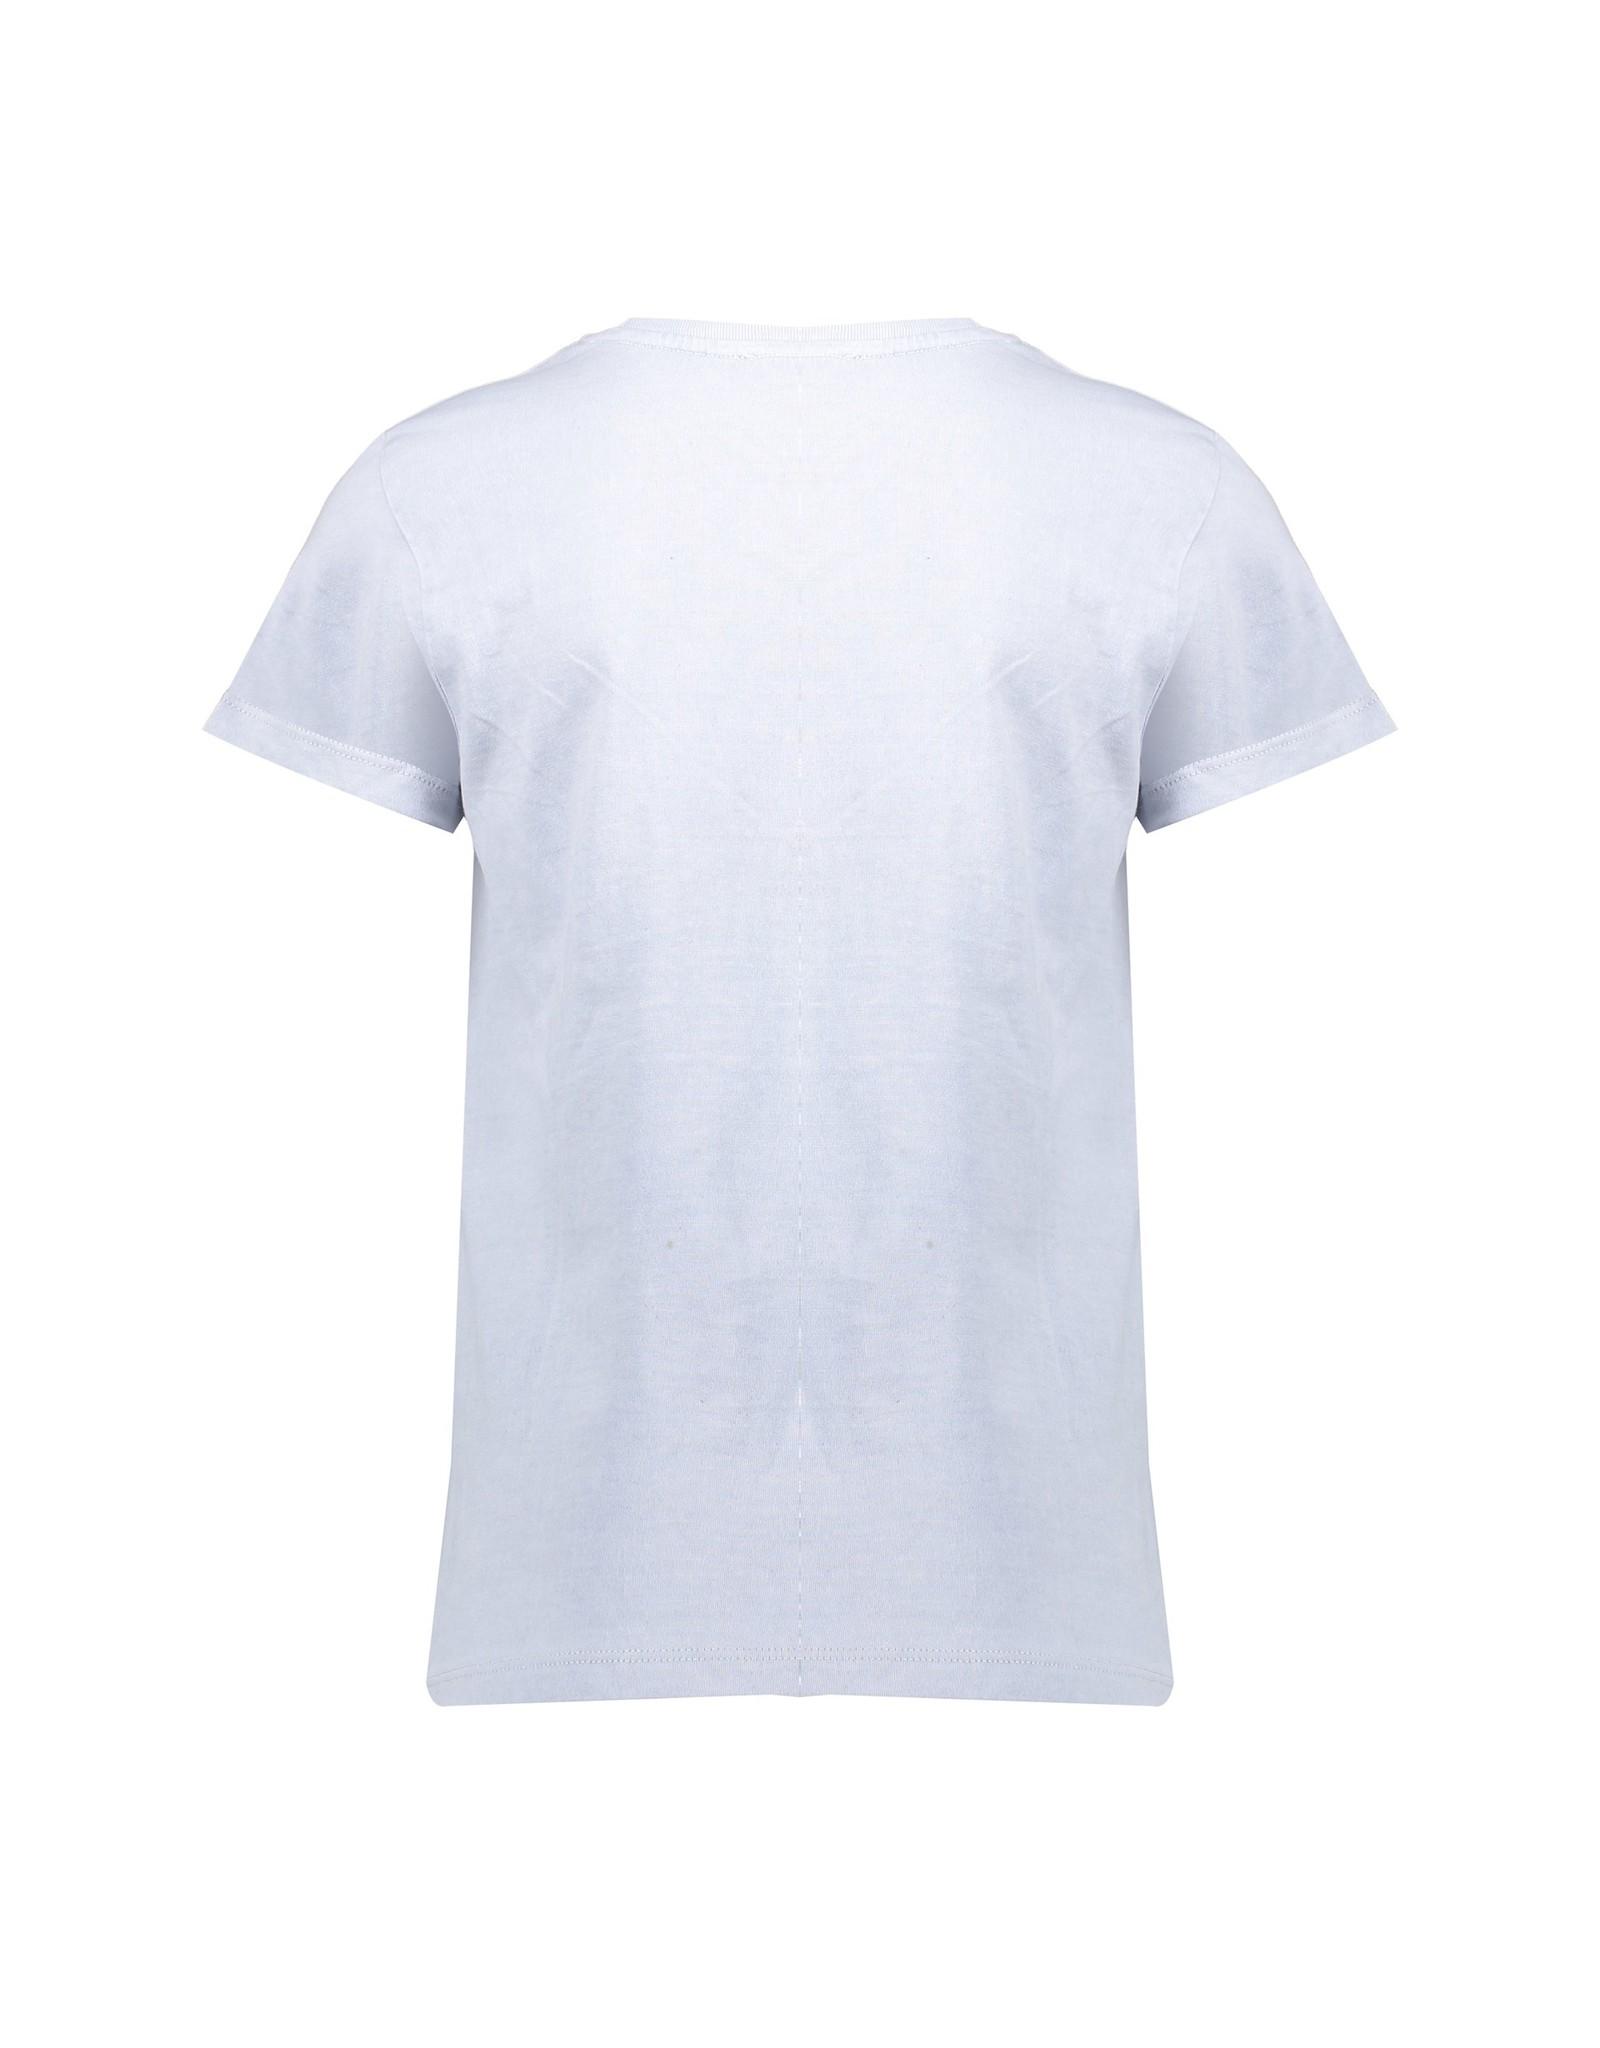 Geisha T-shirt garment dyed tiger head s/s